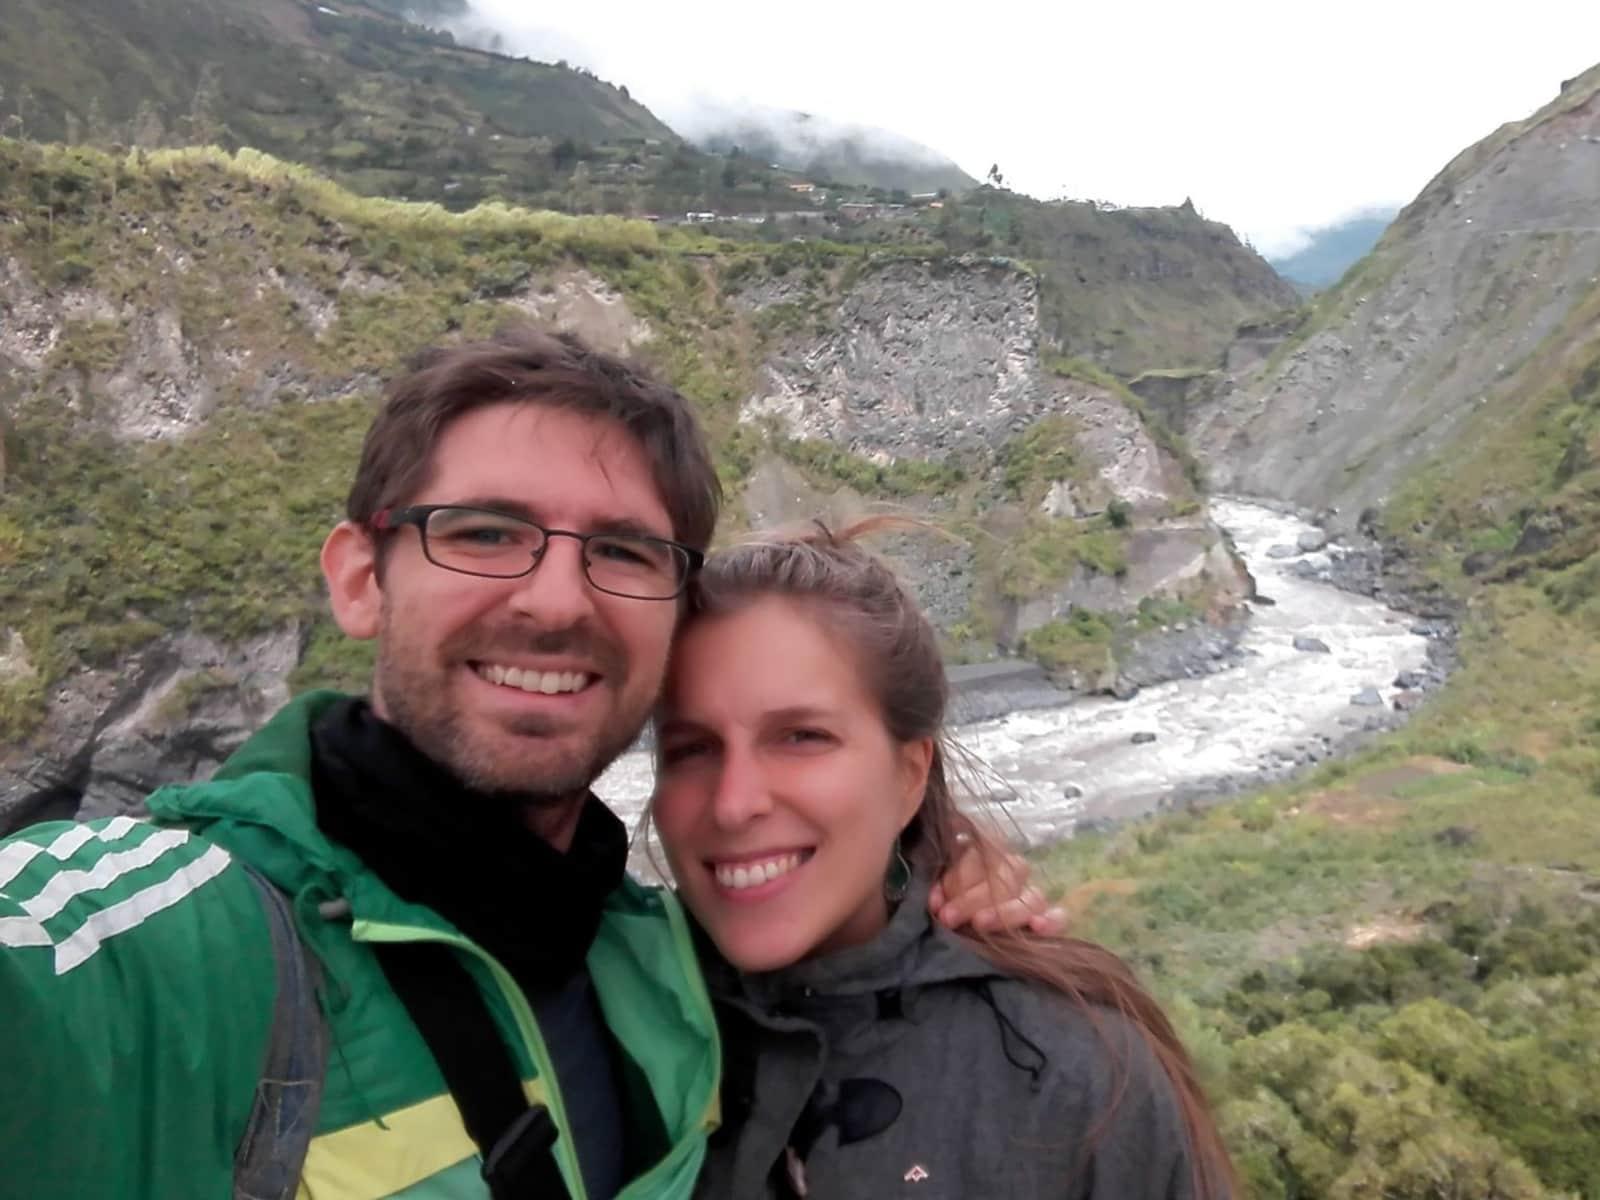 Ornella & Diego from Trelew, Argentina